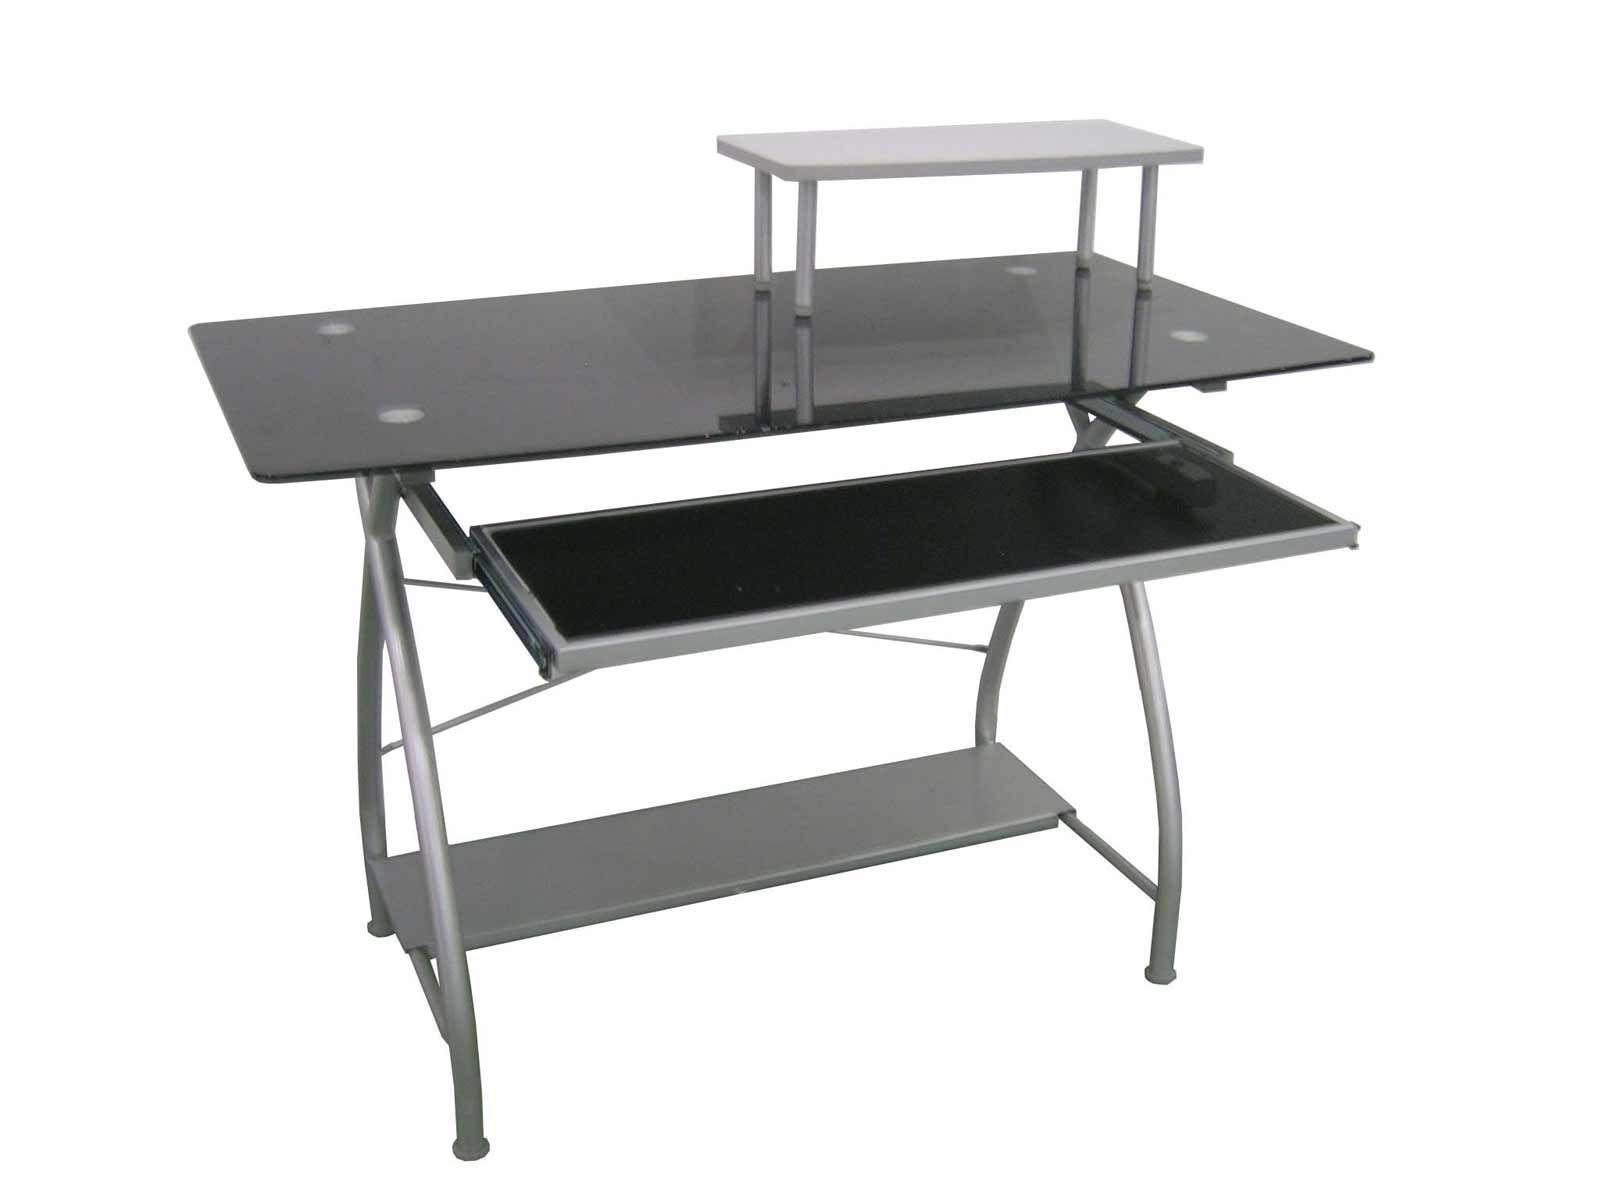 Top Glass Office Metal Computer Desk Blackglassofficedesk Computer Desk Glass Metal O In 2020 Cool Office Desk Metal Computer Desk Glass Desk Office